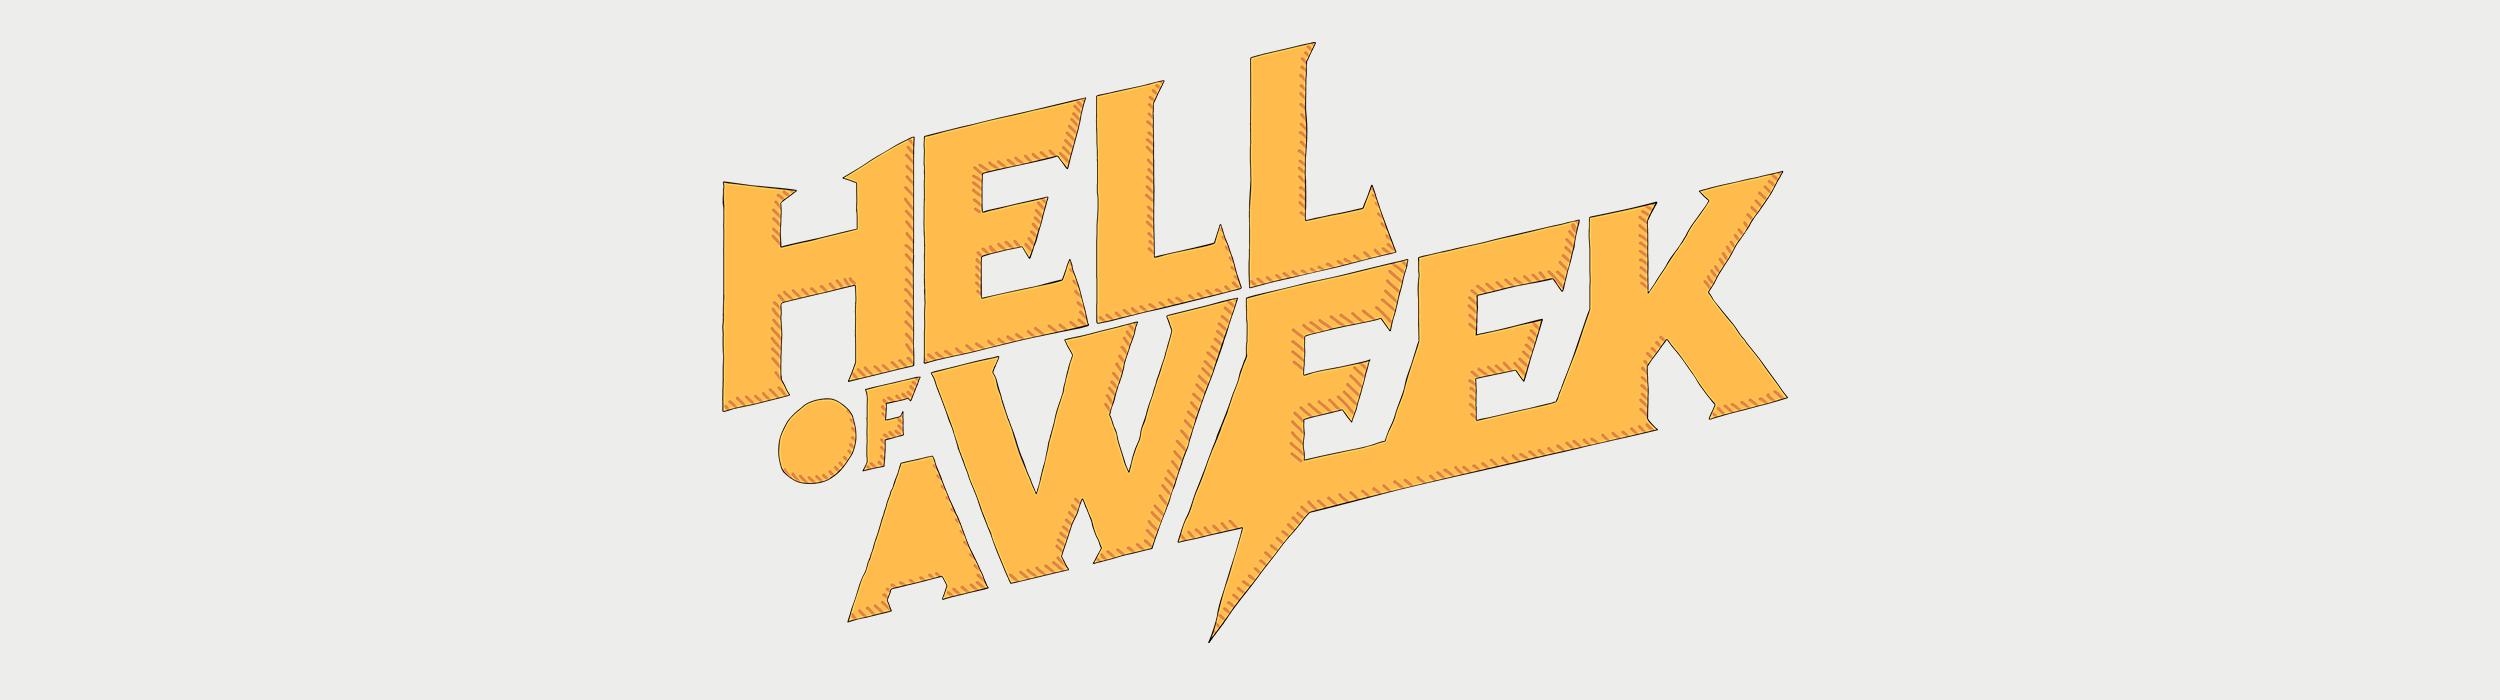 HellOfaWeek_Banner01.jpg